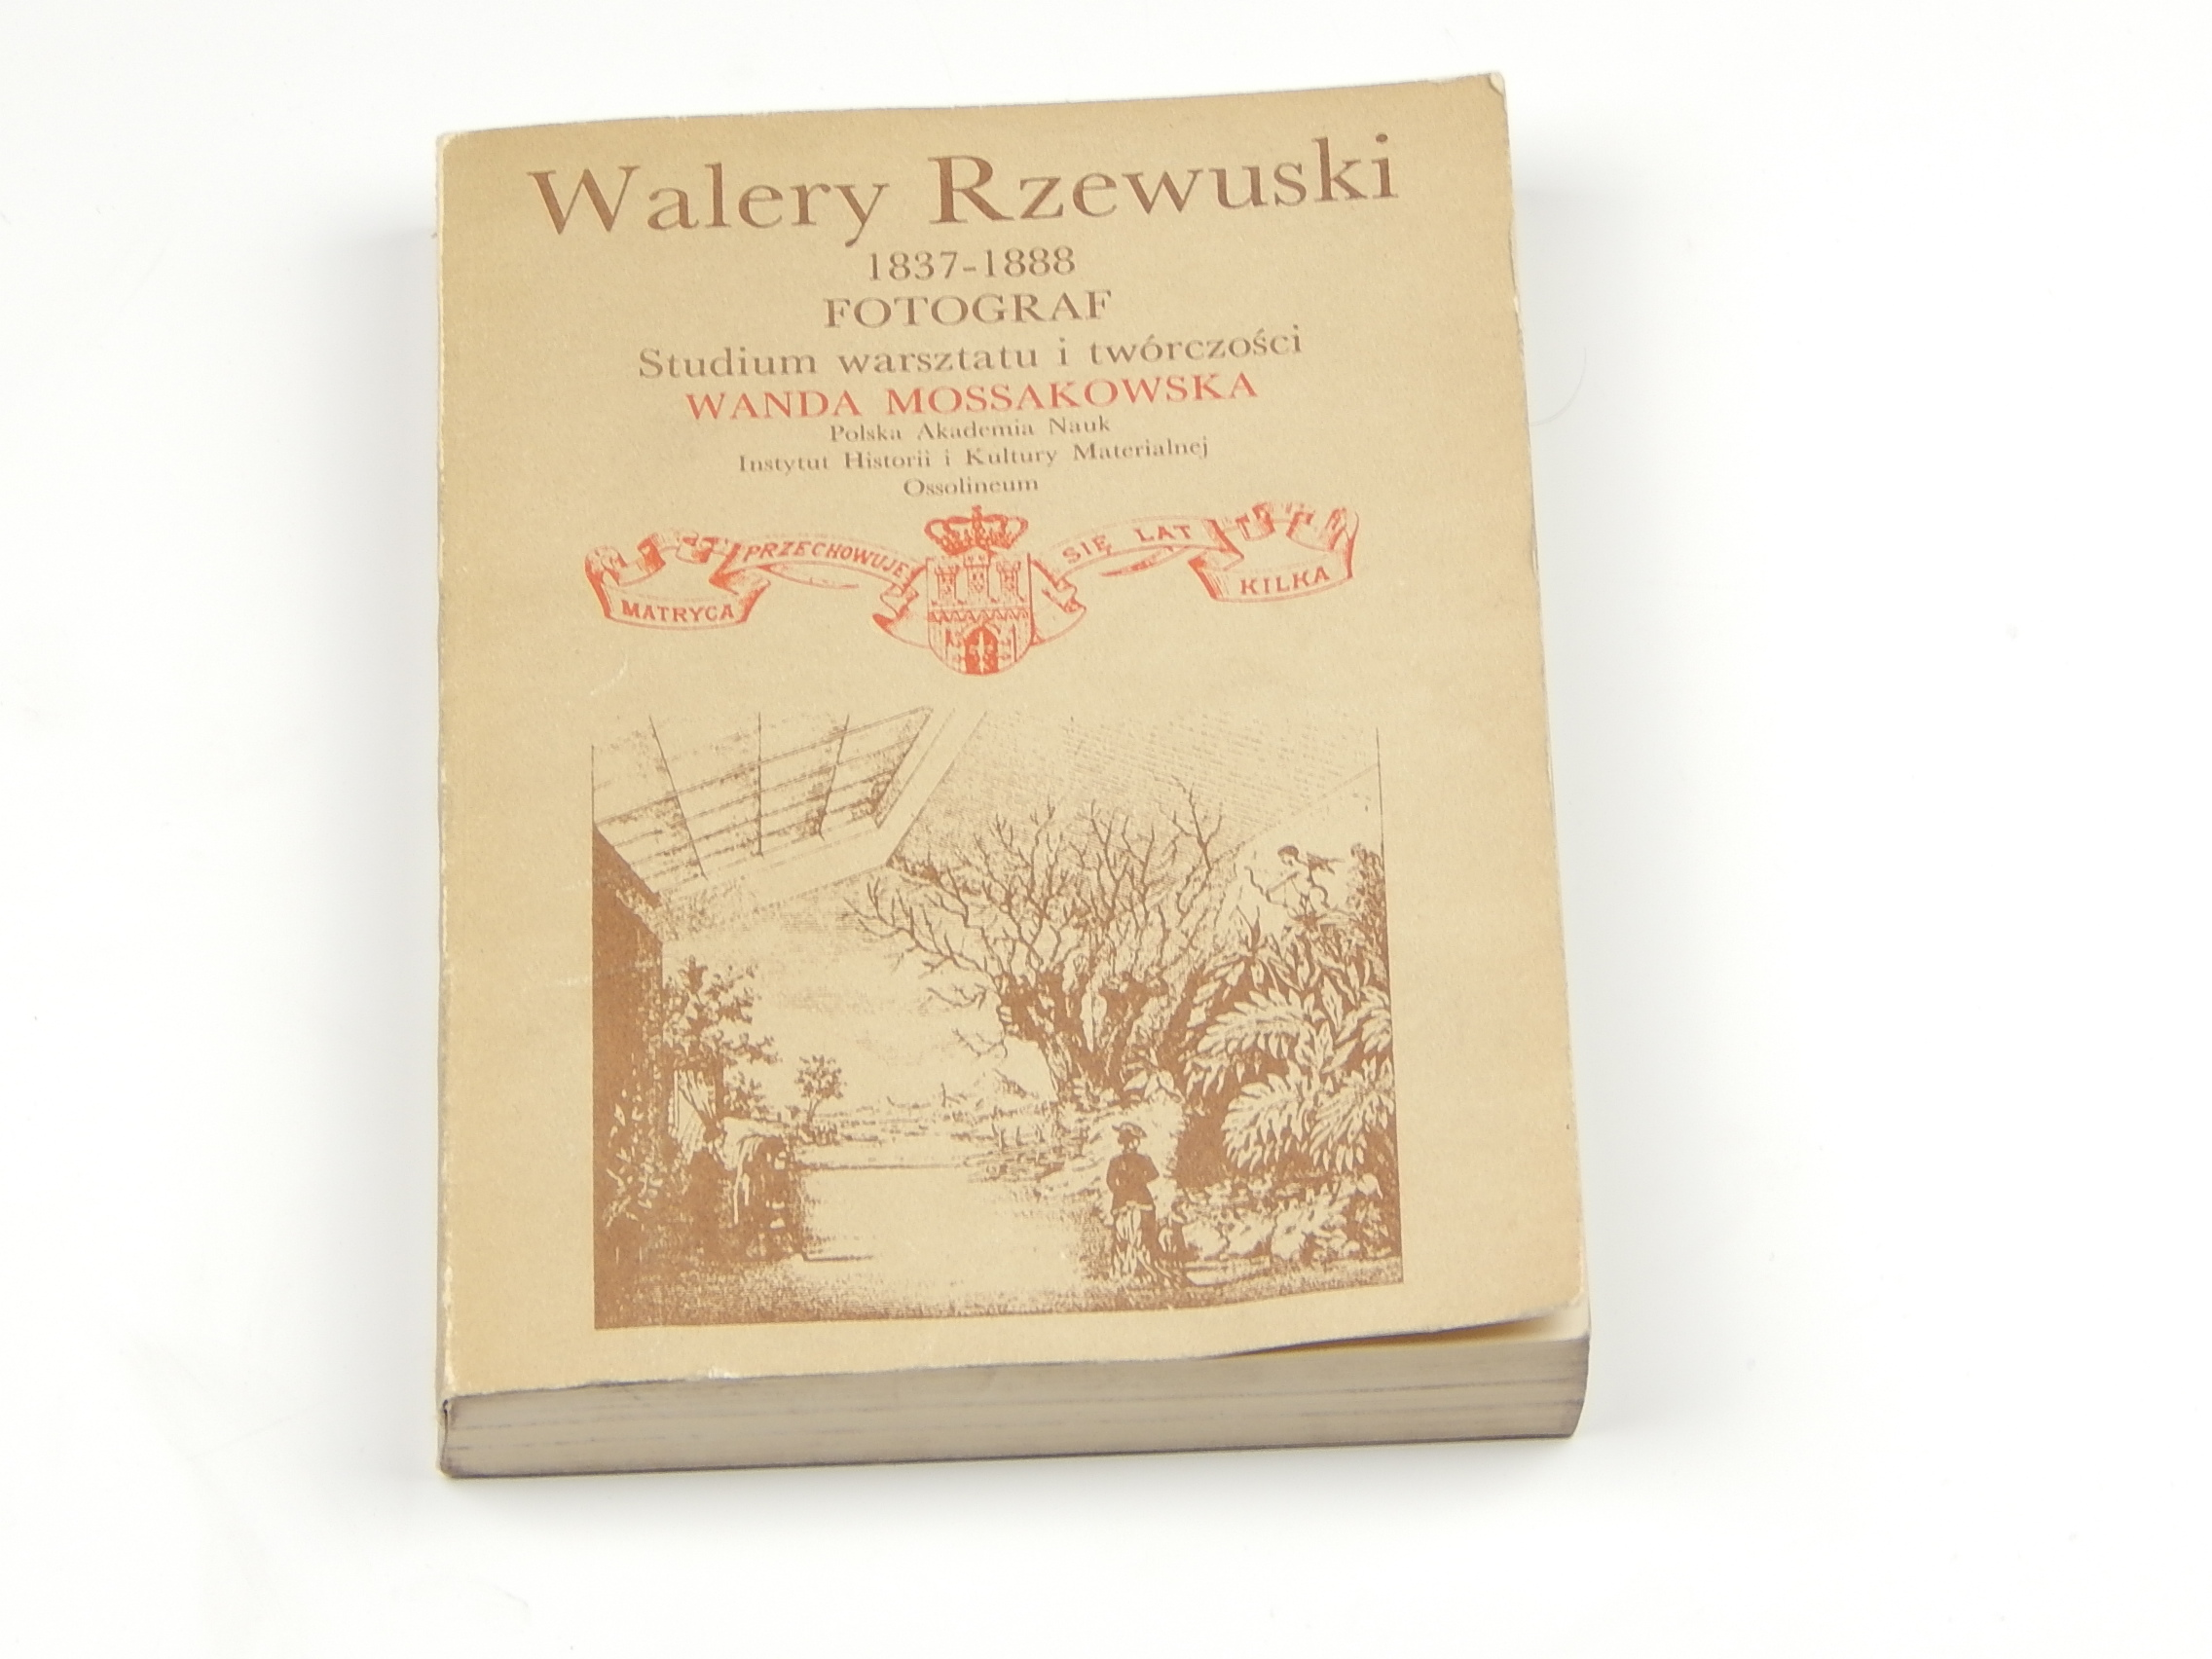 WALERY RZEWUSKI FOTOGRAF STUDIUM MOSSAKOWSKA